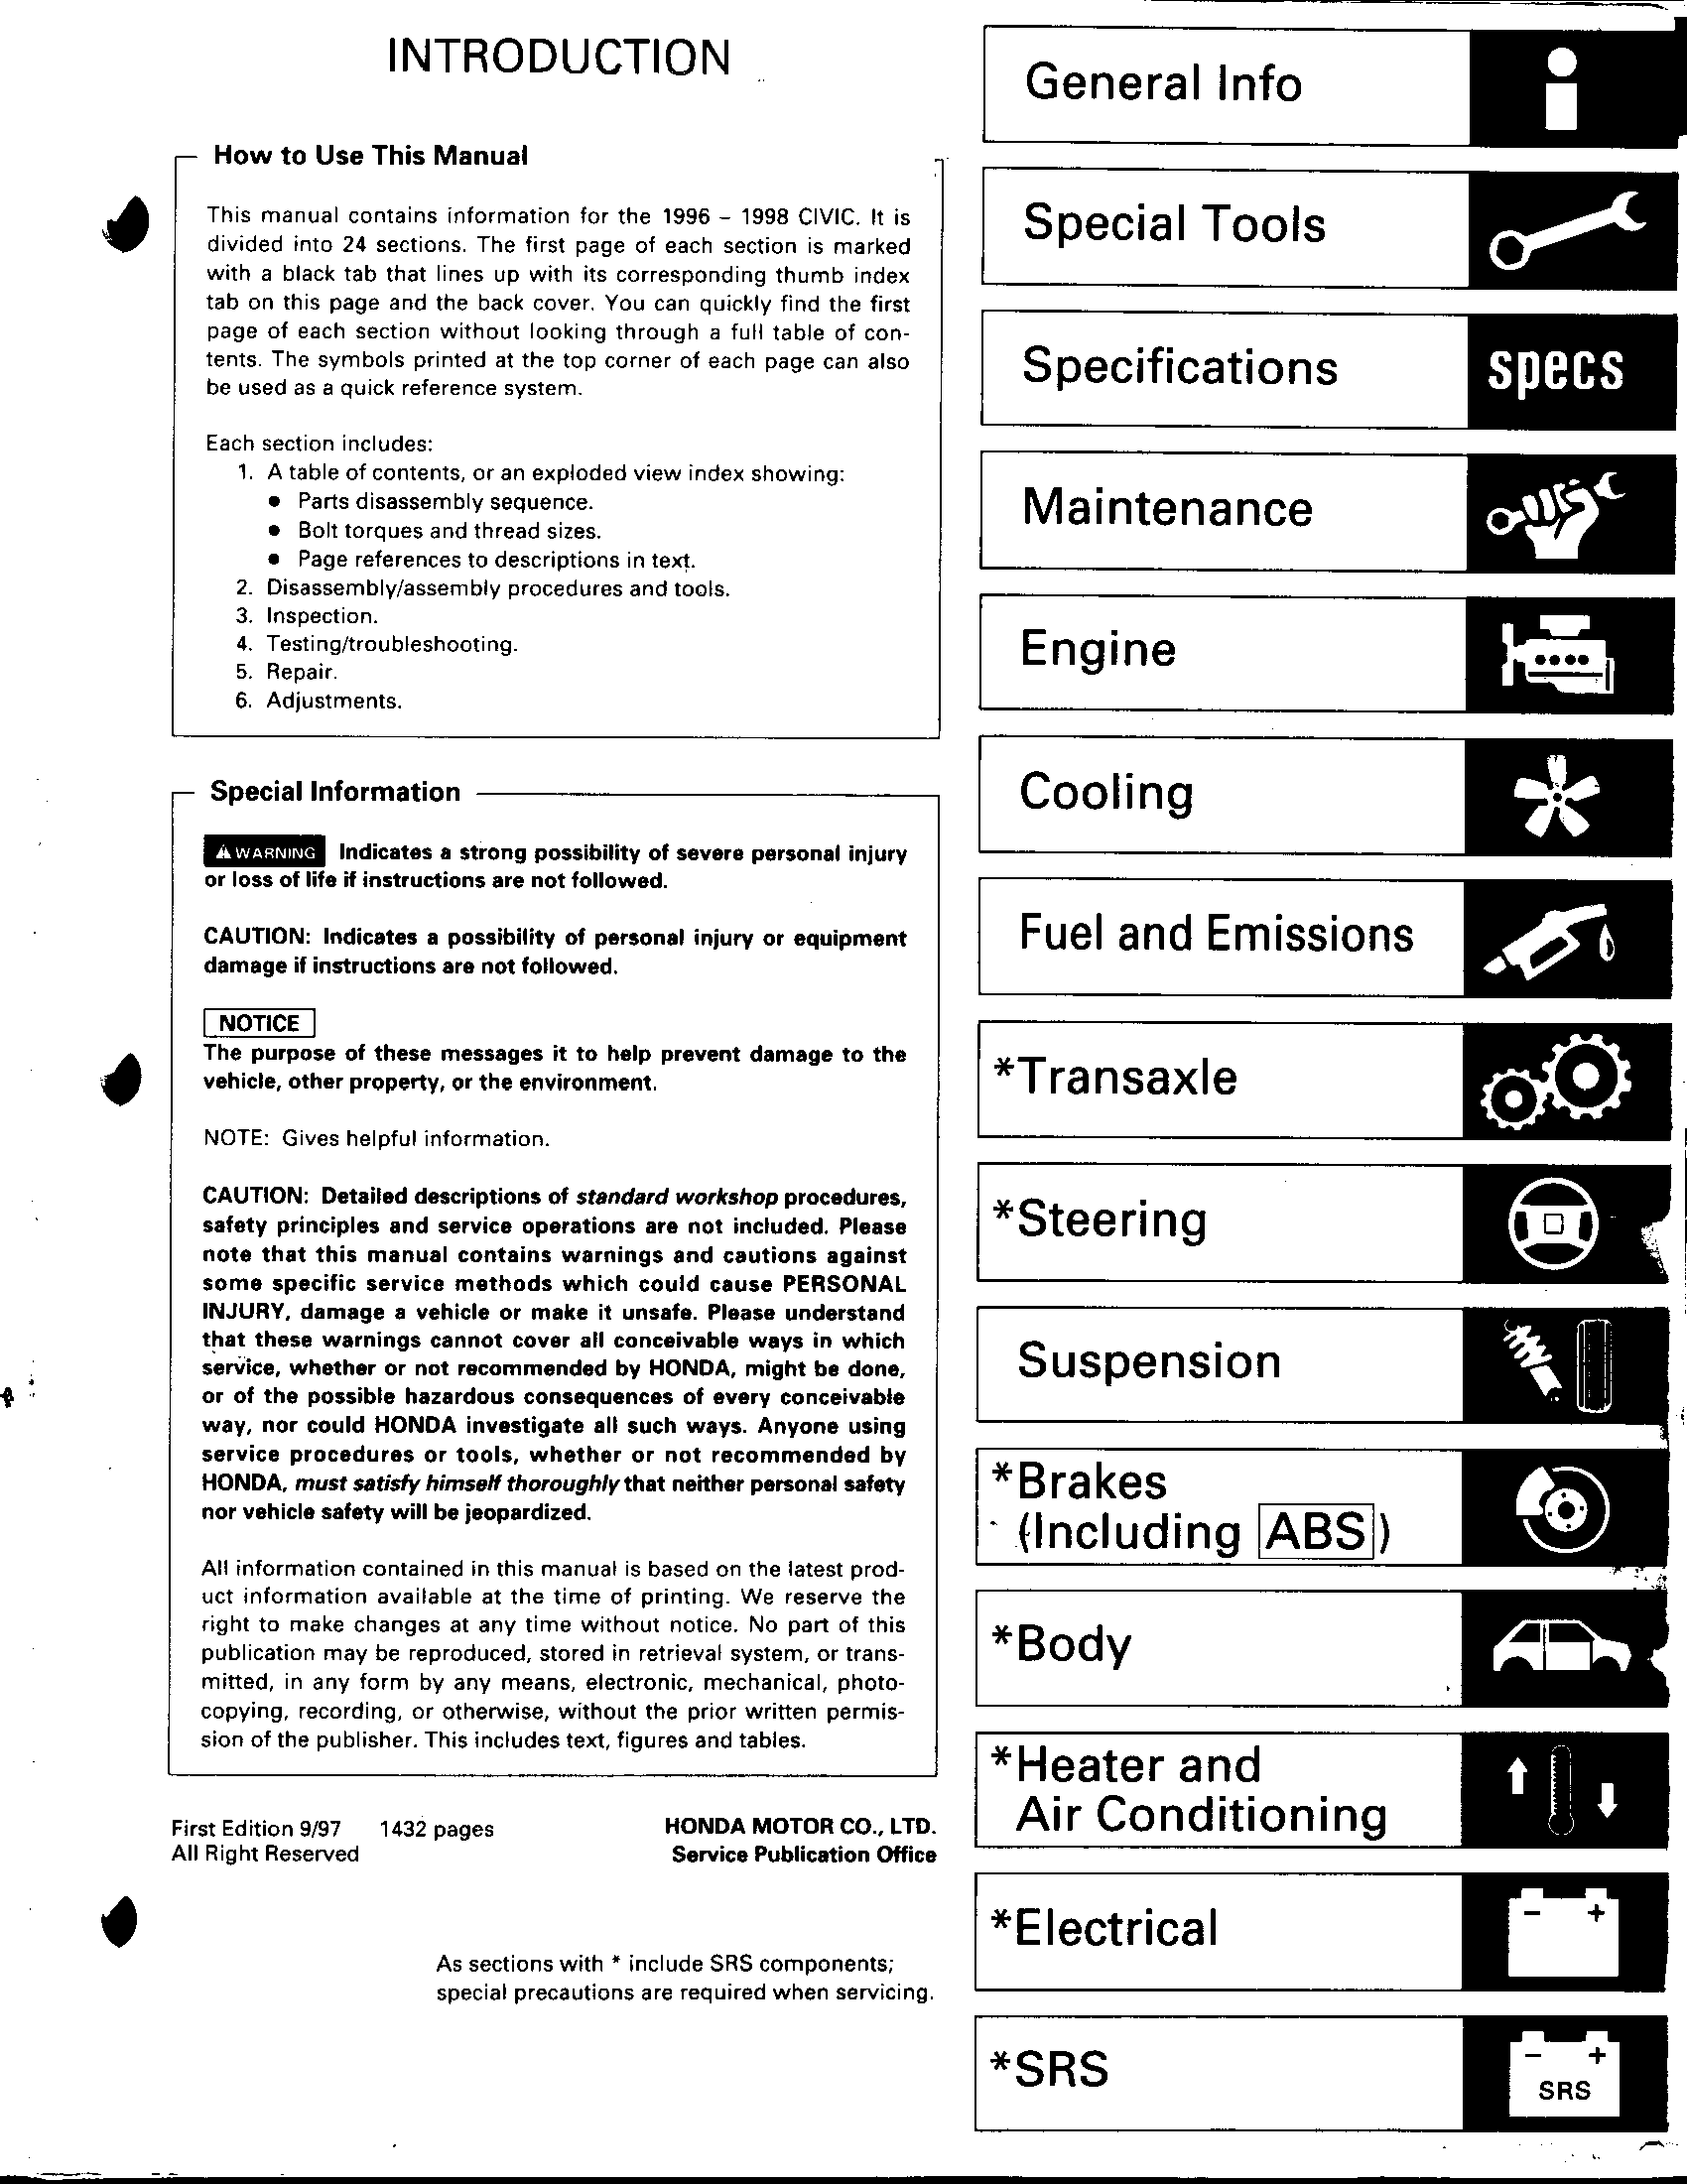 2008 Honda Civic Service Manual Pdf Manual Guide